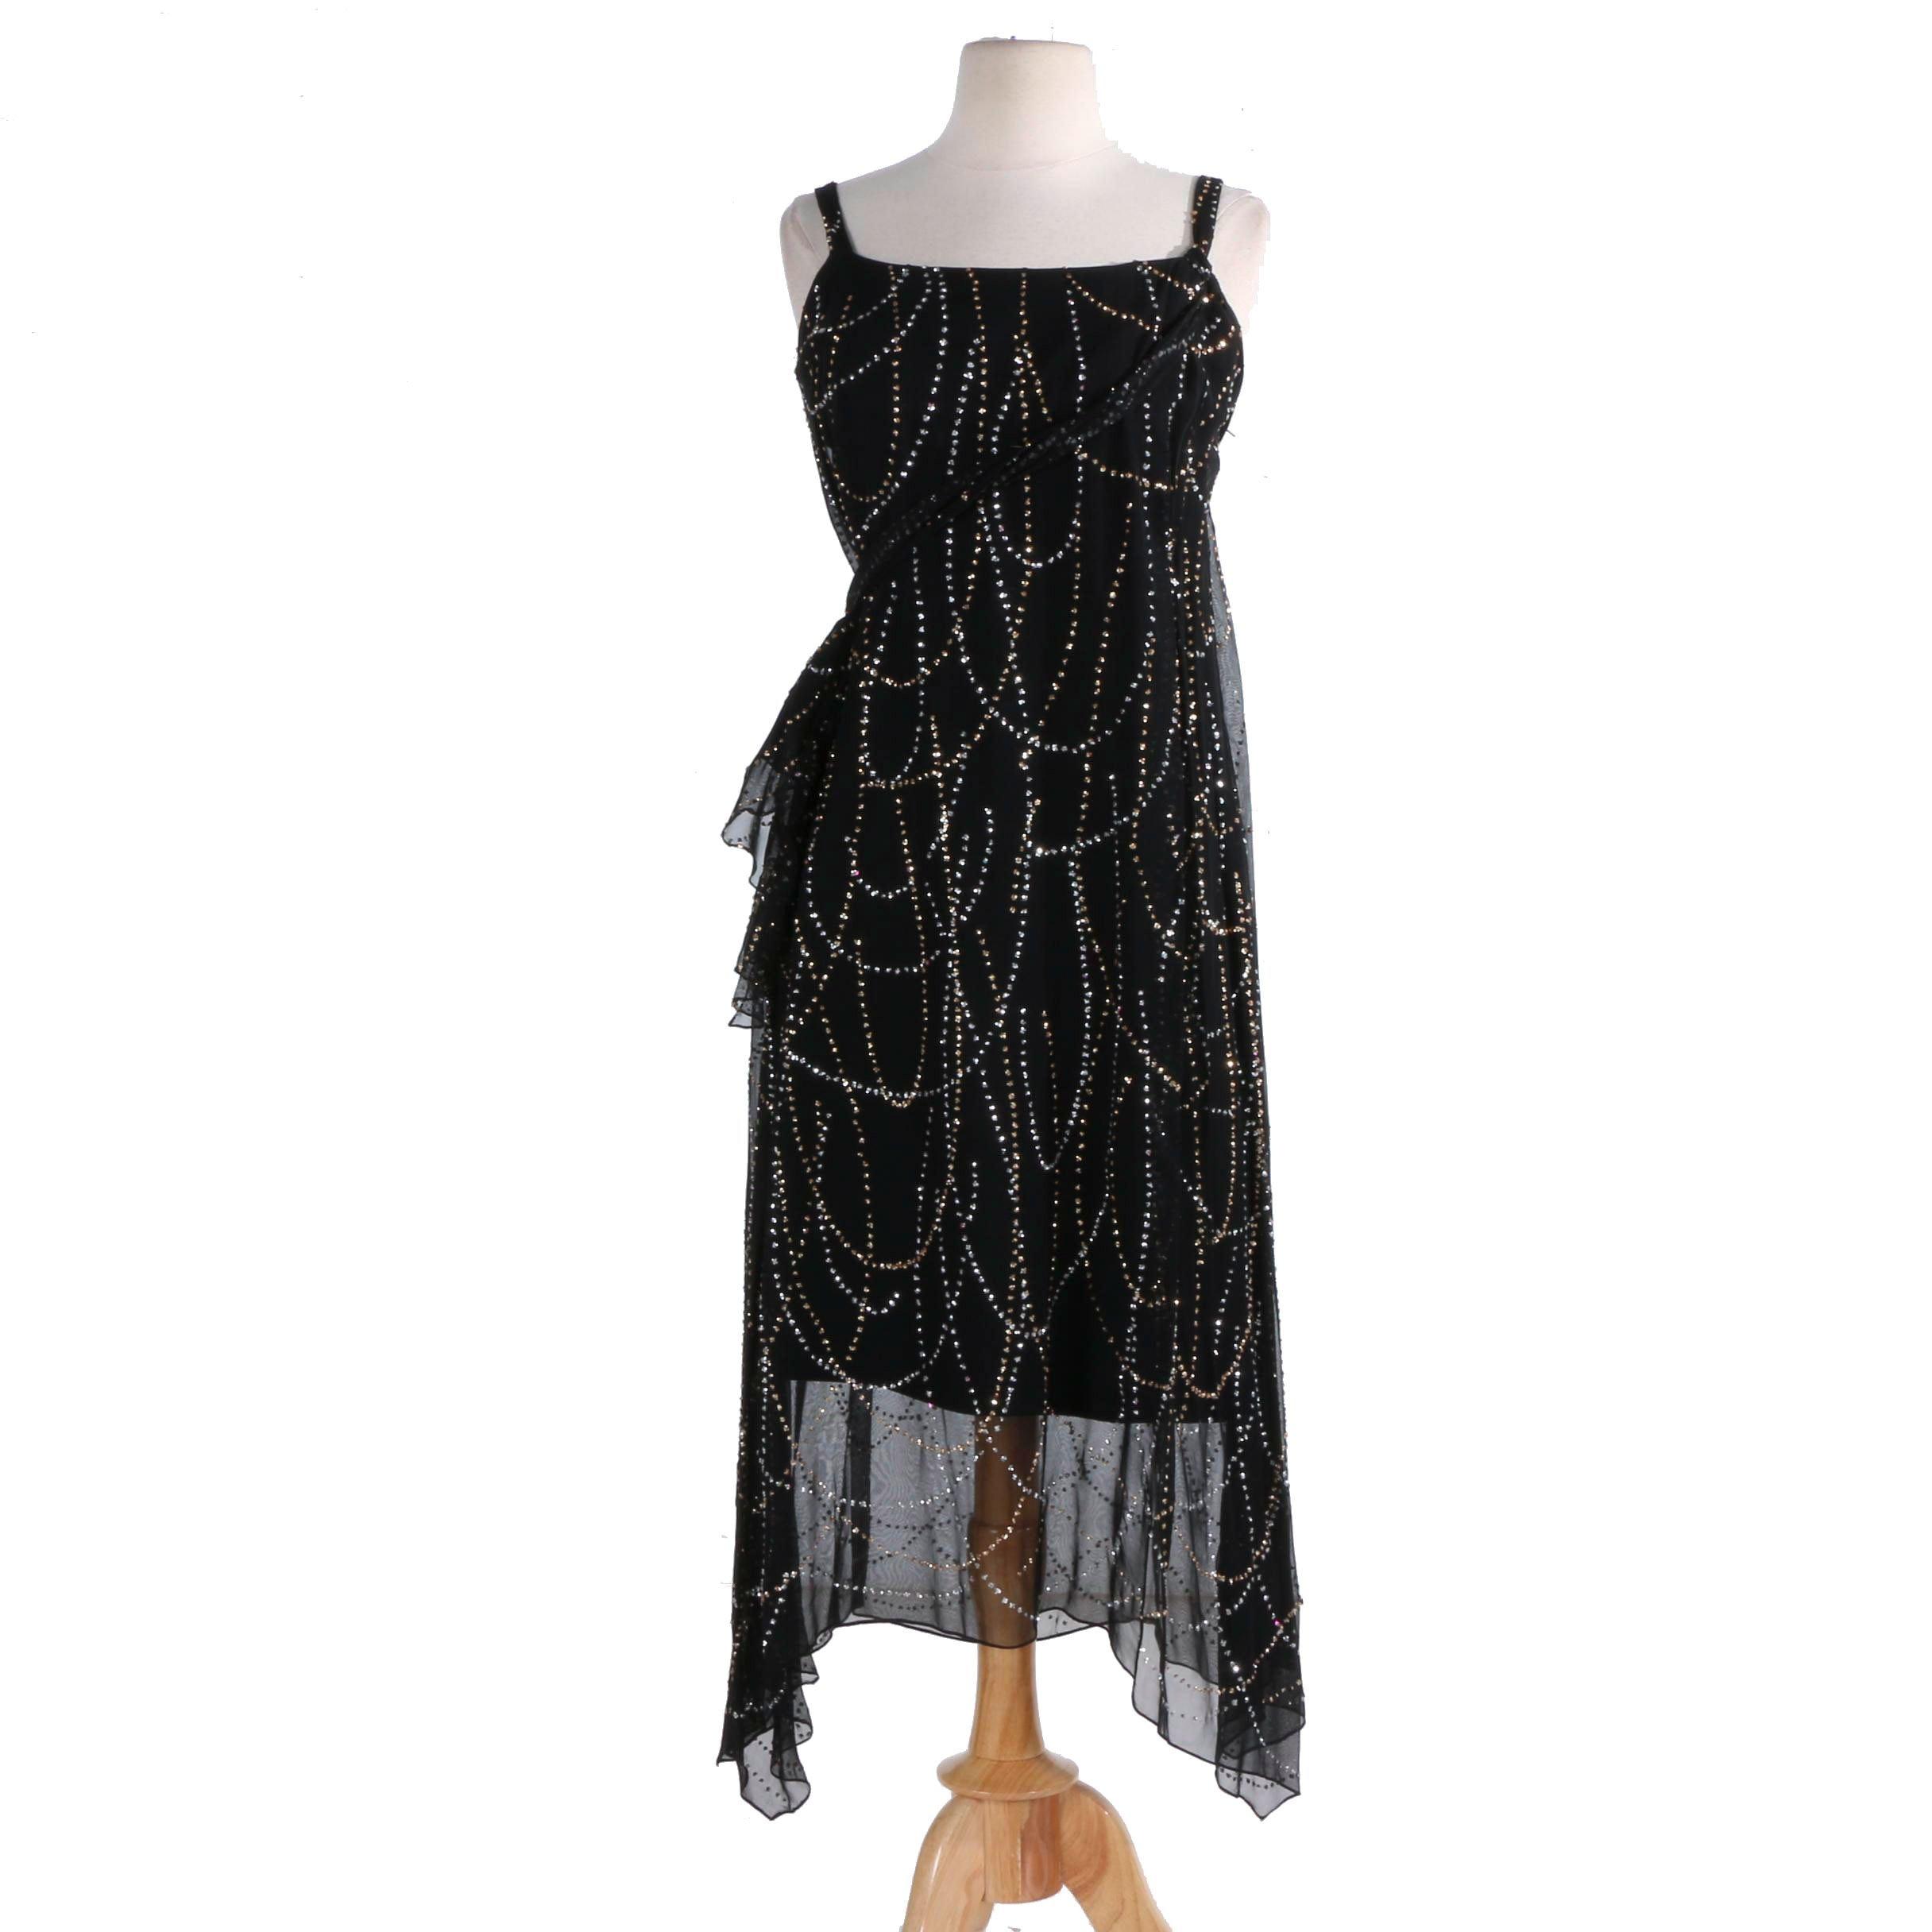 Pauline Trigere Sequined Dress